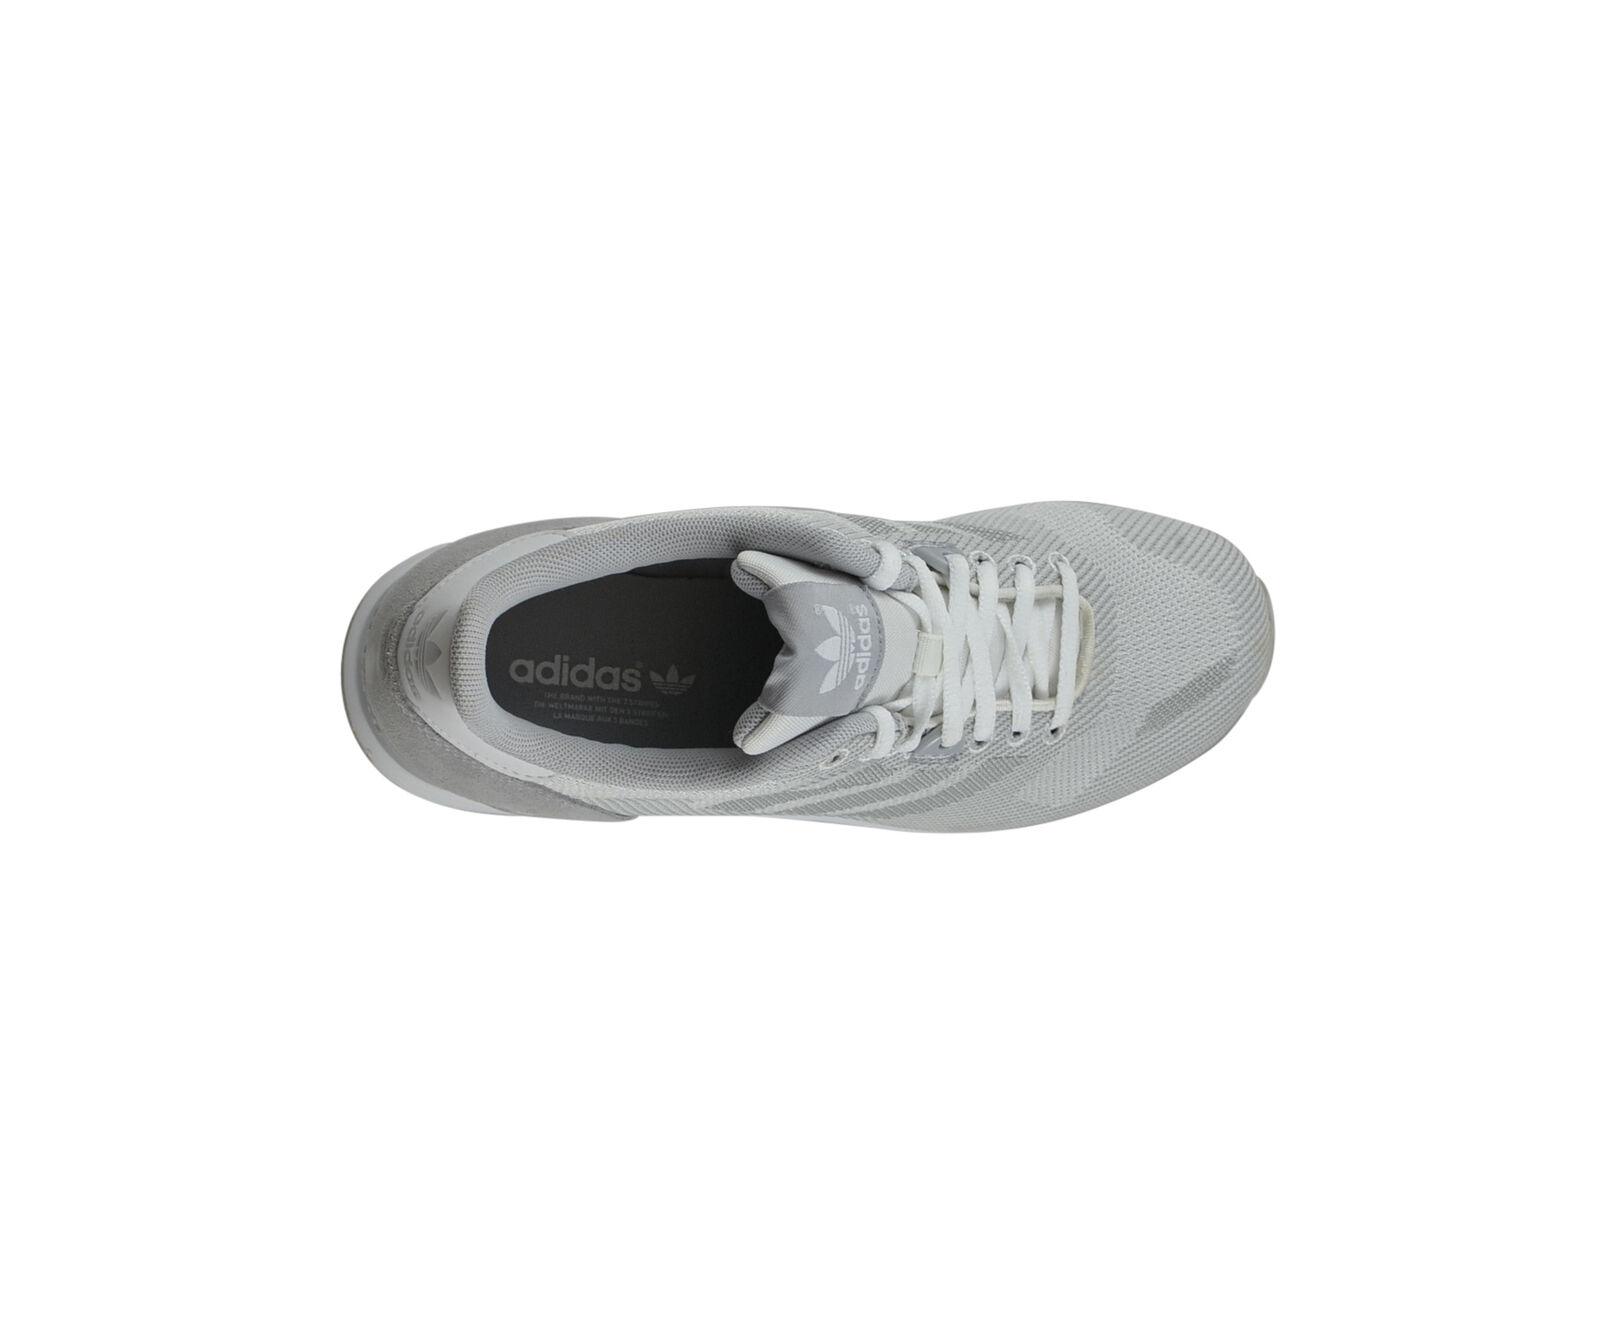 Adidas ZX 700 Weave W W W vinwht clonix ftwwht Schuhe Turnschuhe grau weiß 5f558f